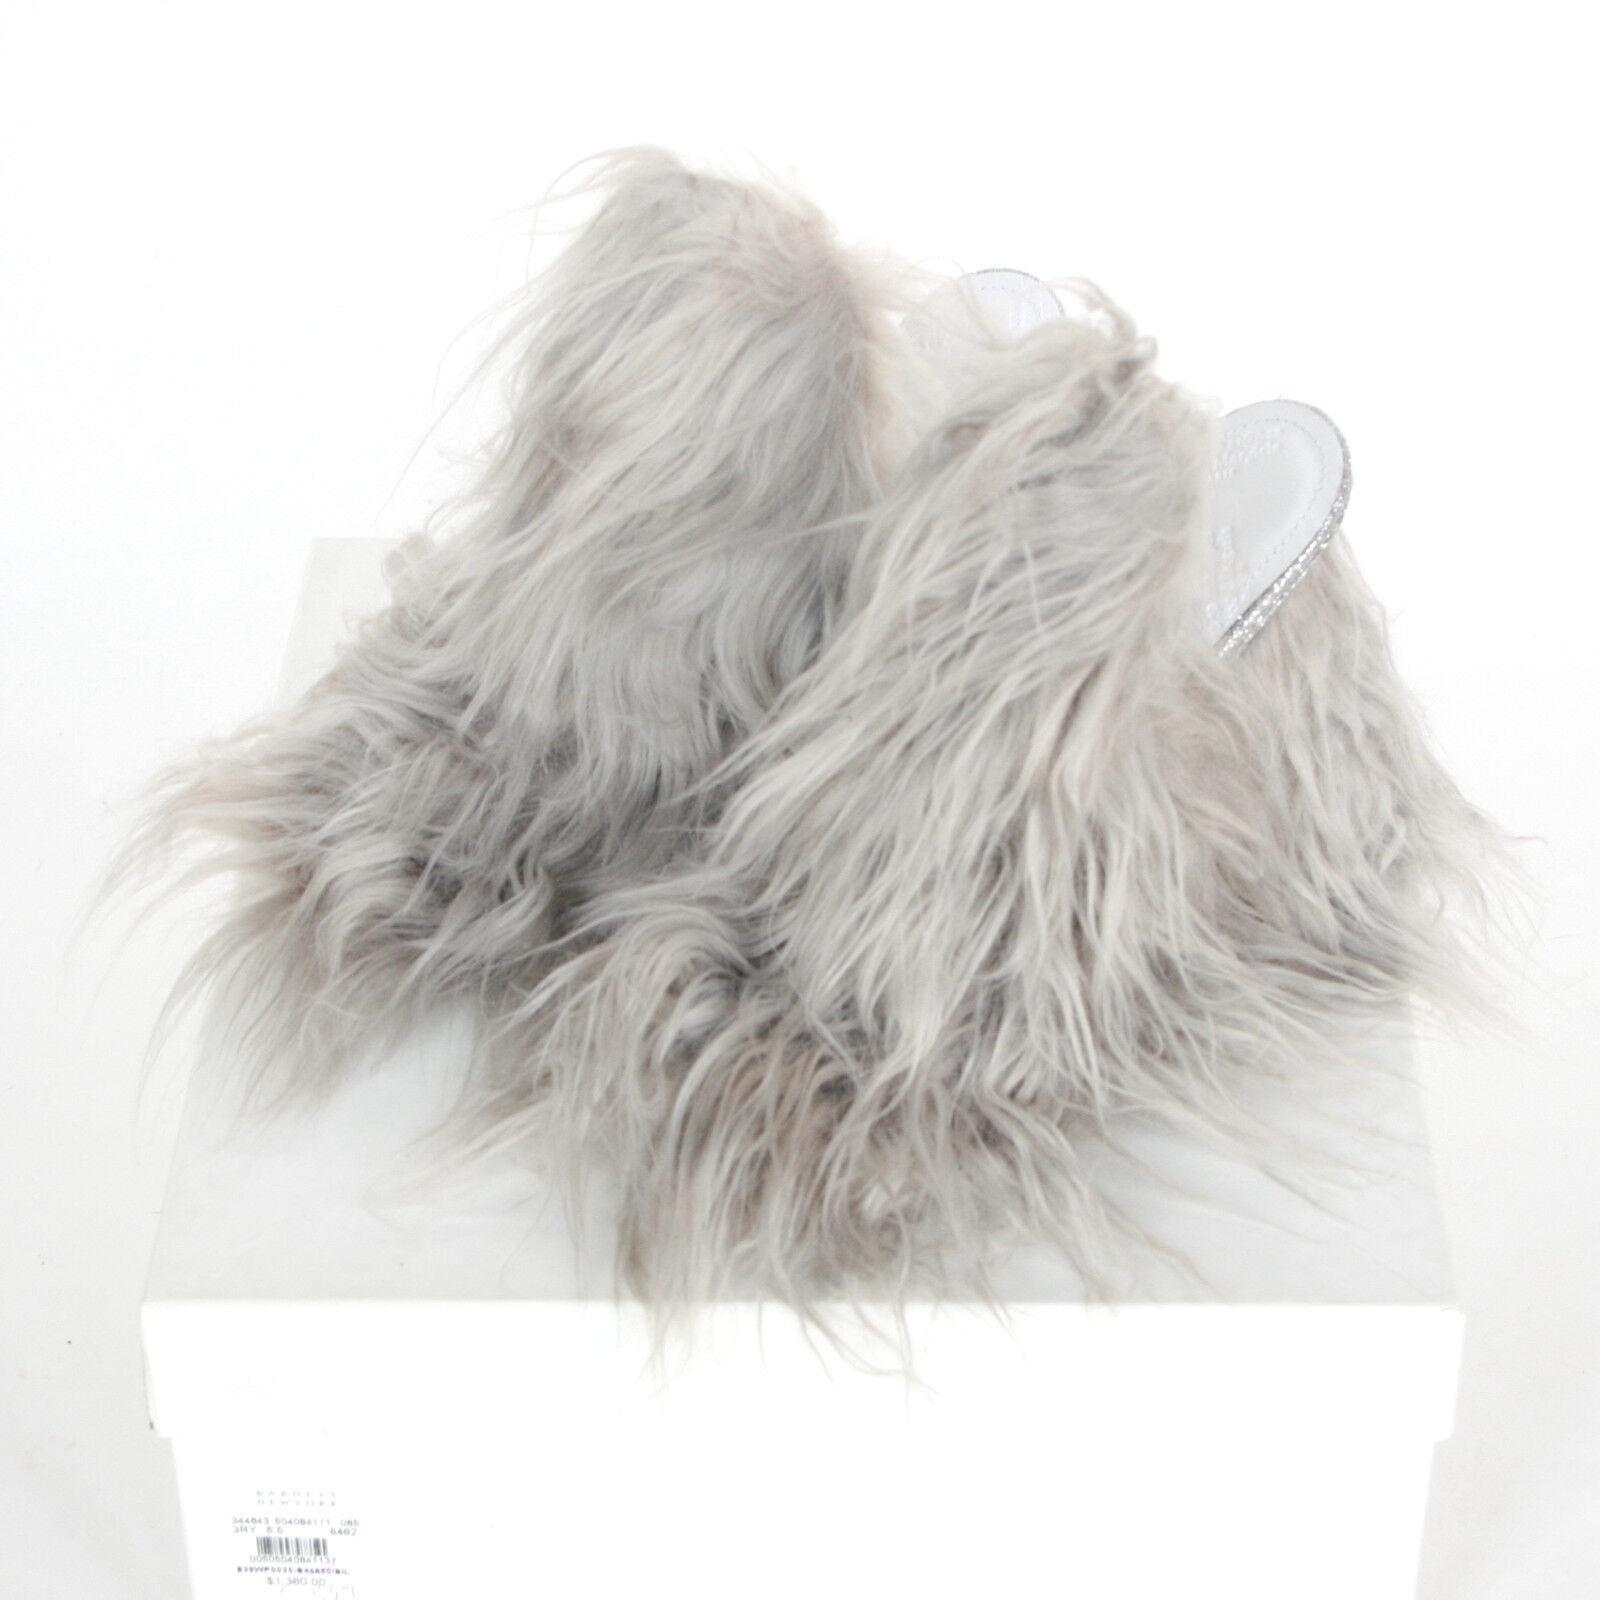 i nuovi stili più caldi MAISON MARTIN MARGIELA  1360 faux fur glitter glitter glitter mules high heel scarpe 35.5 5.5 NEW  negozio online outlet